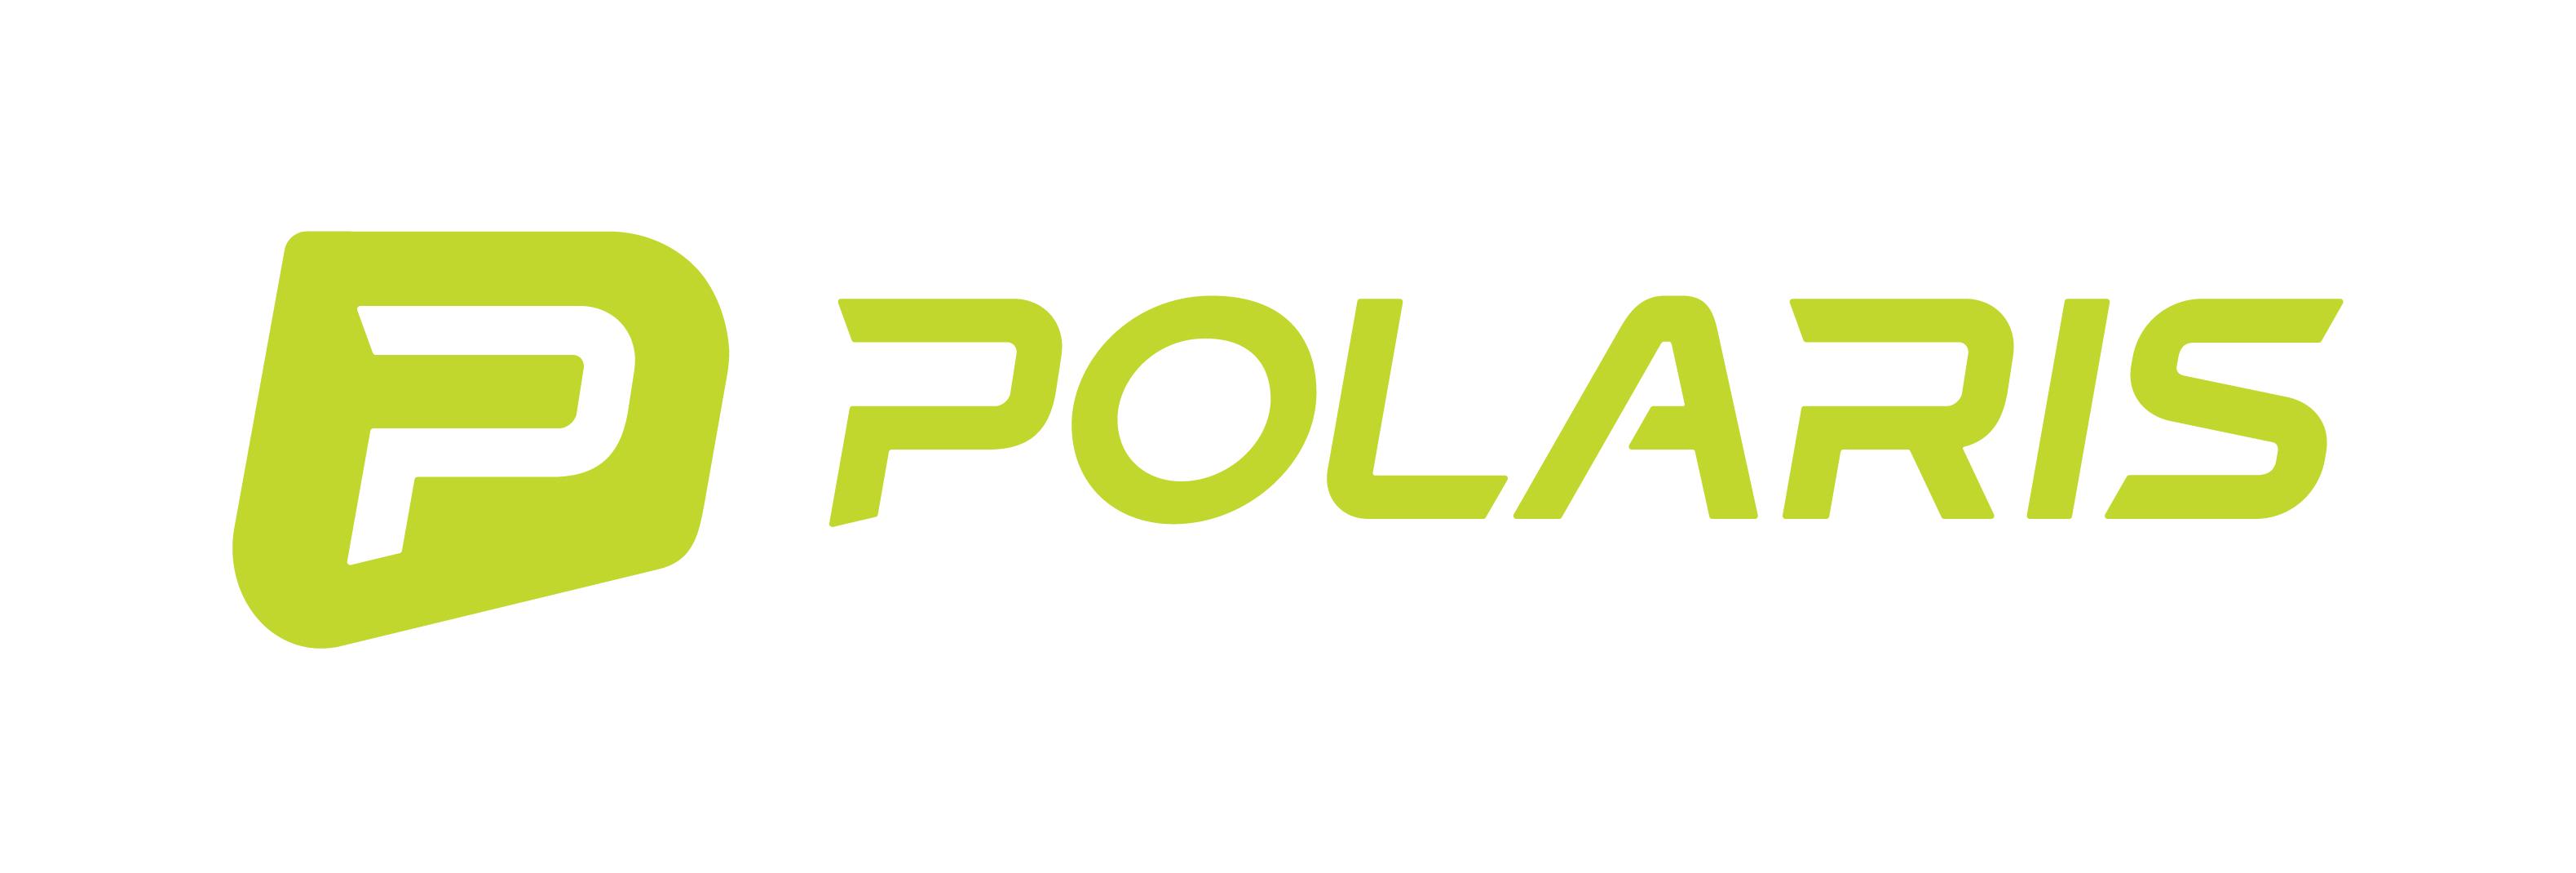 Green_Polaris_Linear (1)